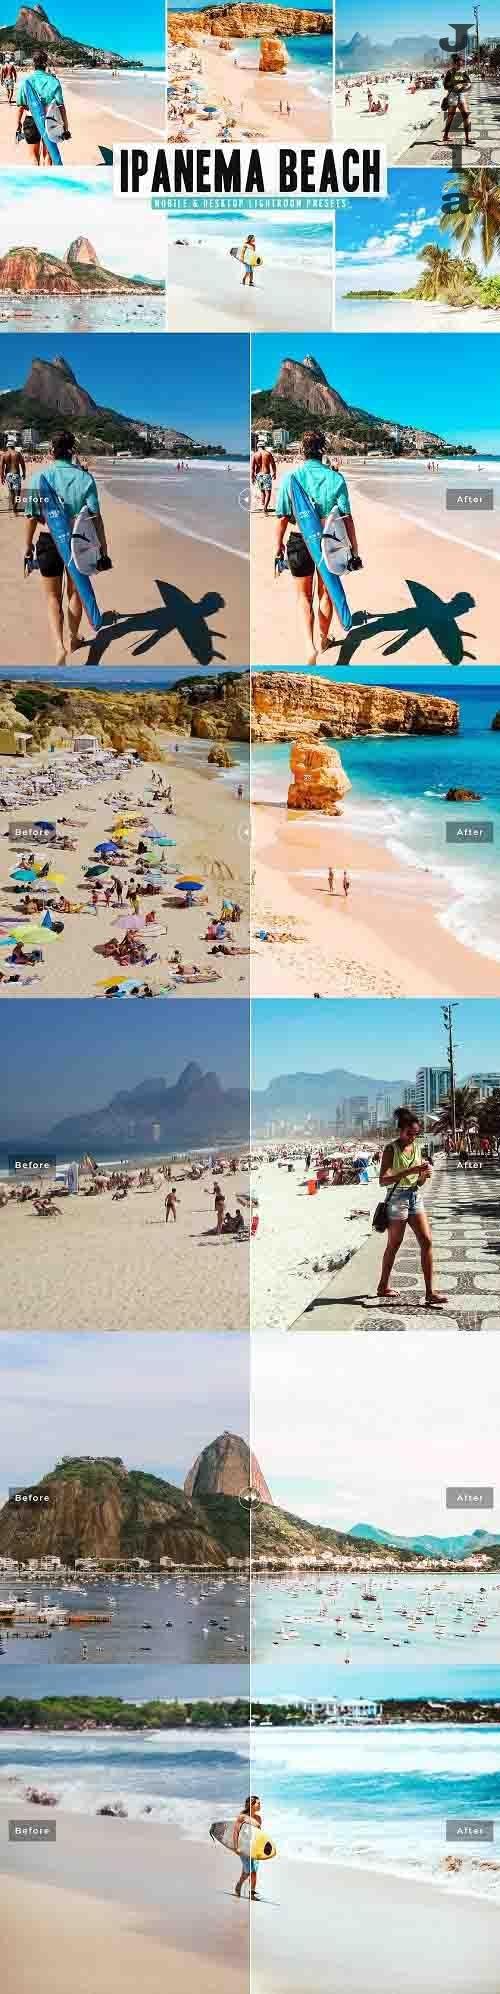 Ipanema Beach Pro Lightroom Presets - 5665929 - Mobile & Desktop